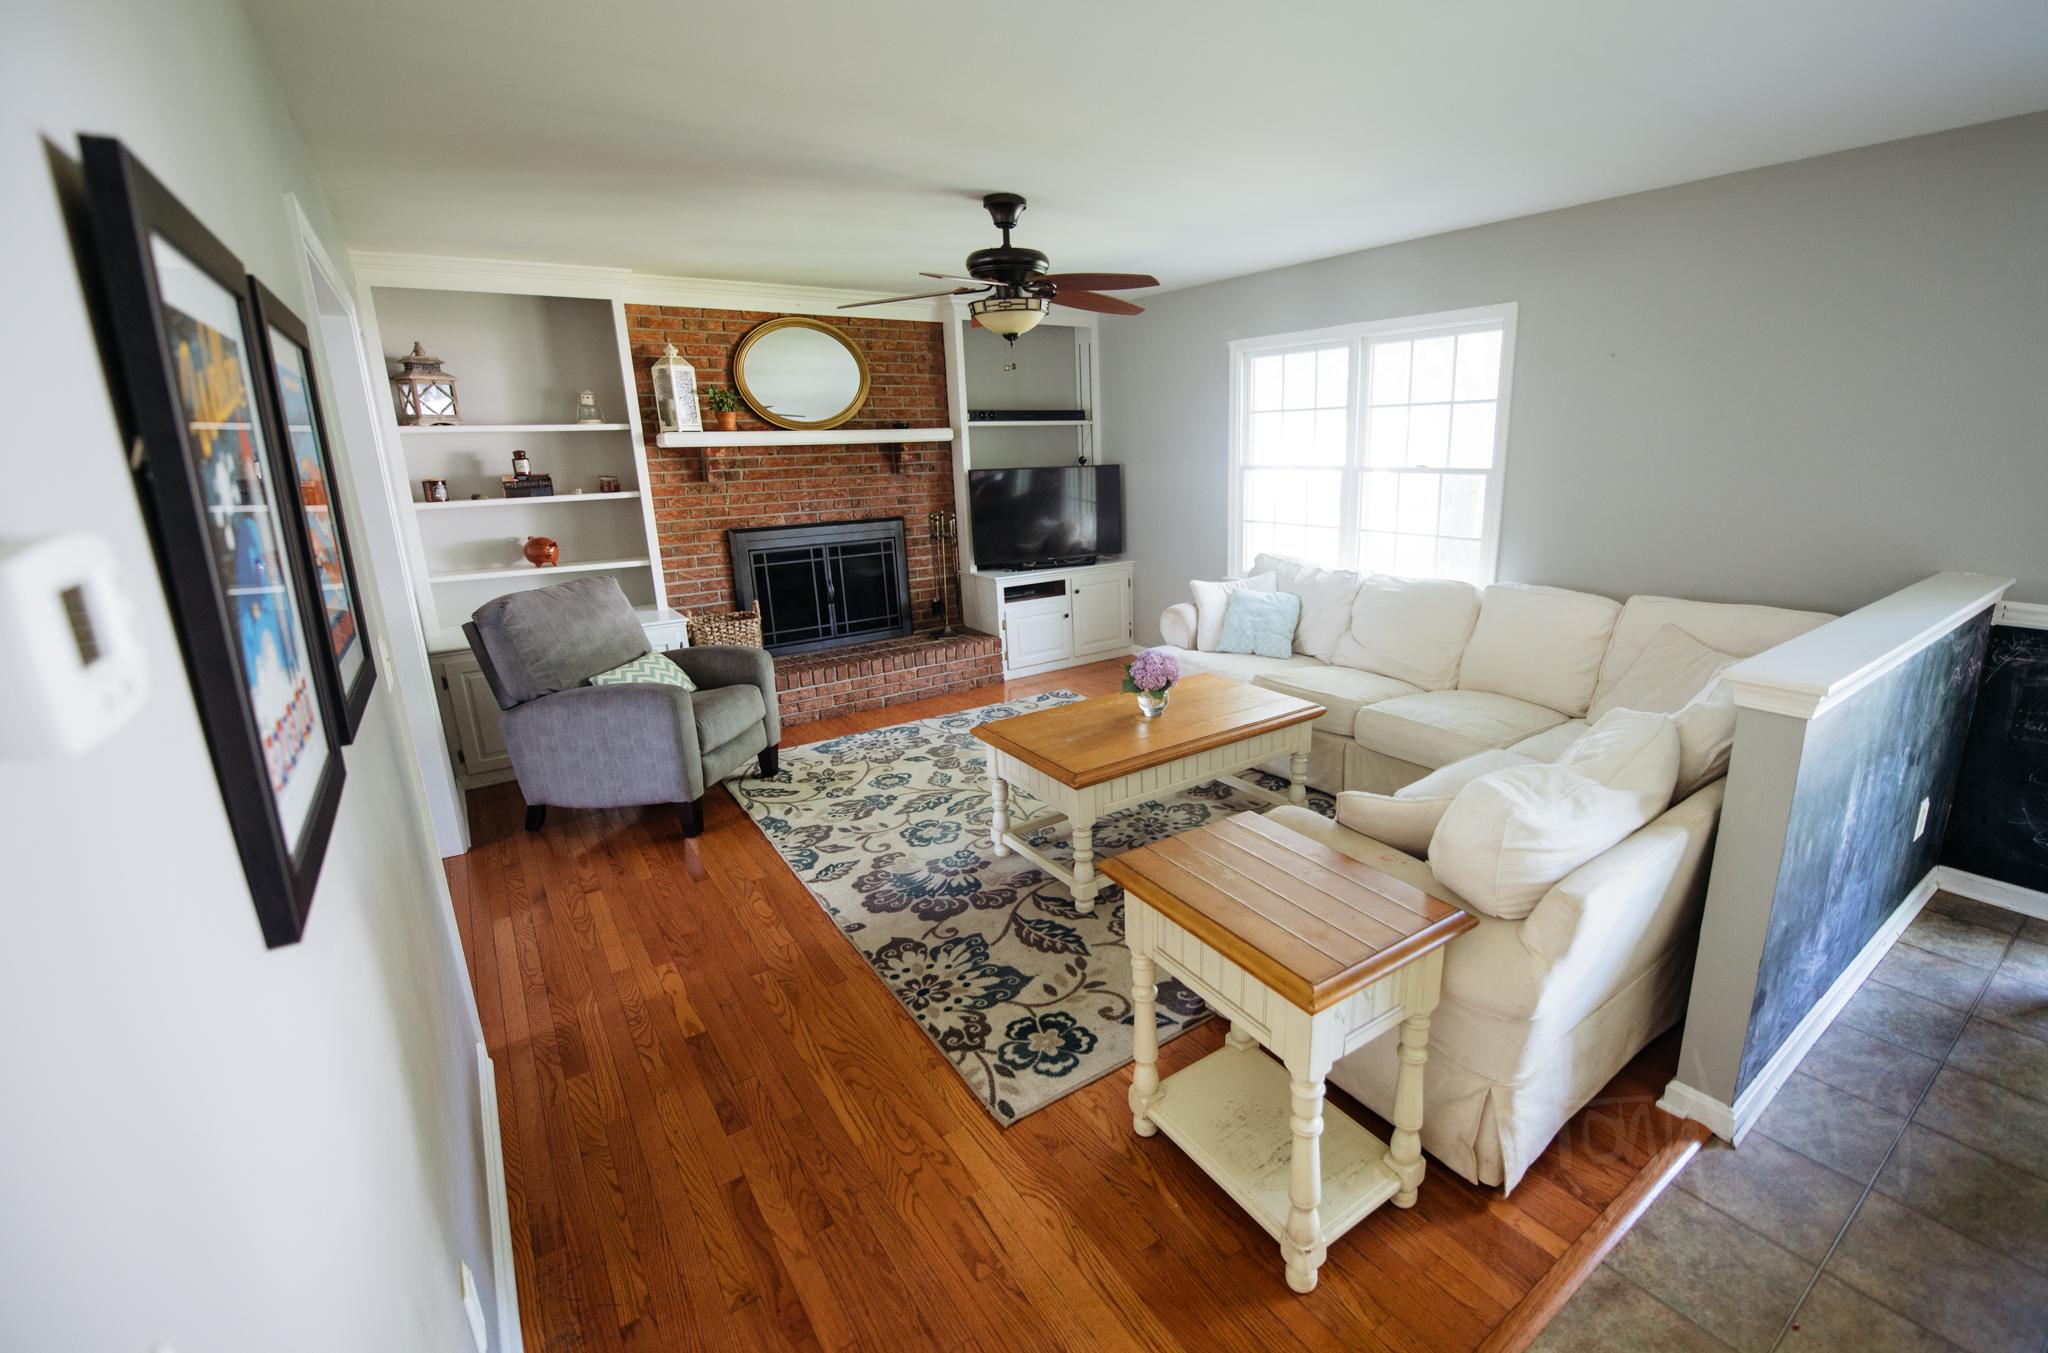 Living room (morning time)